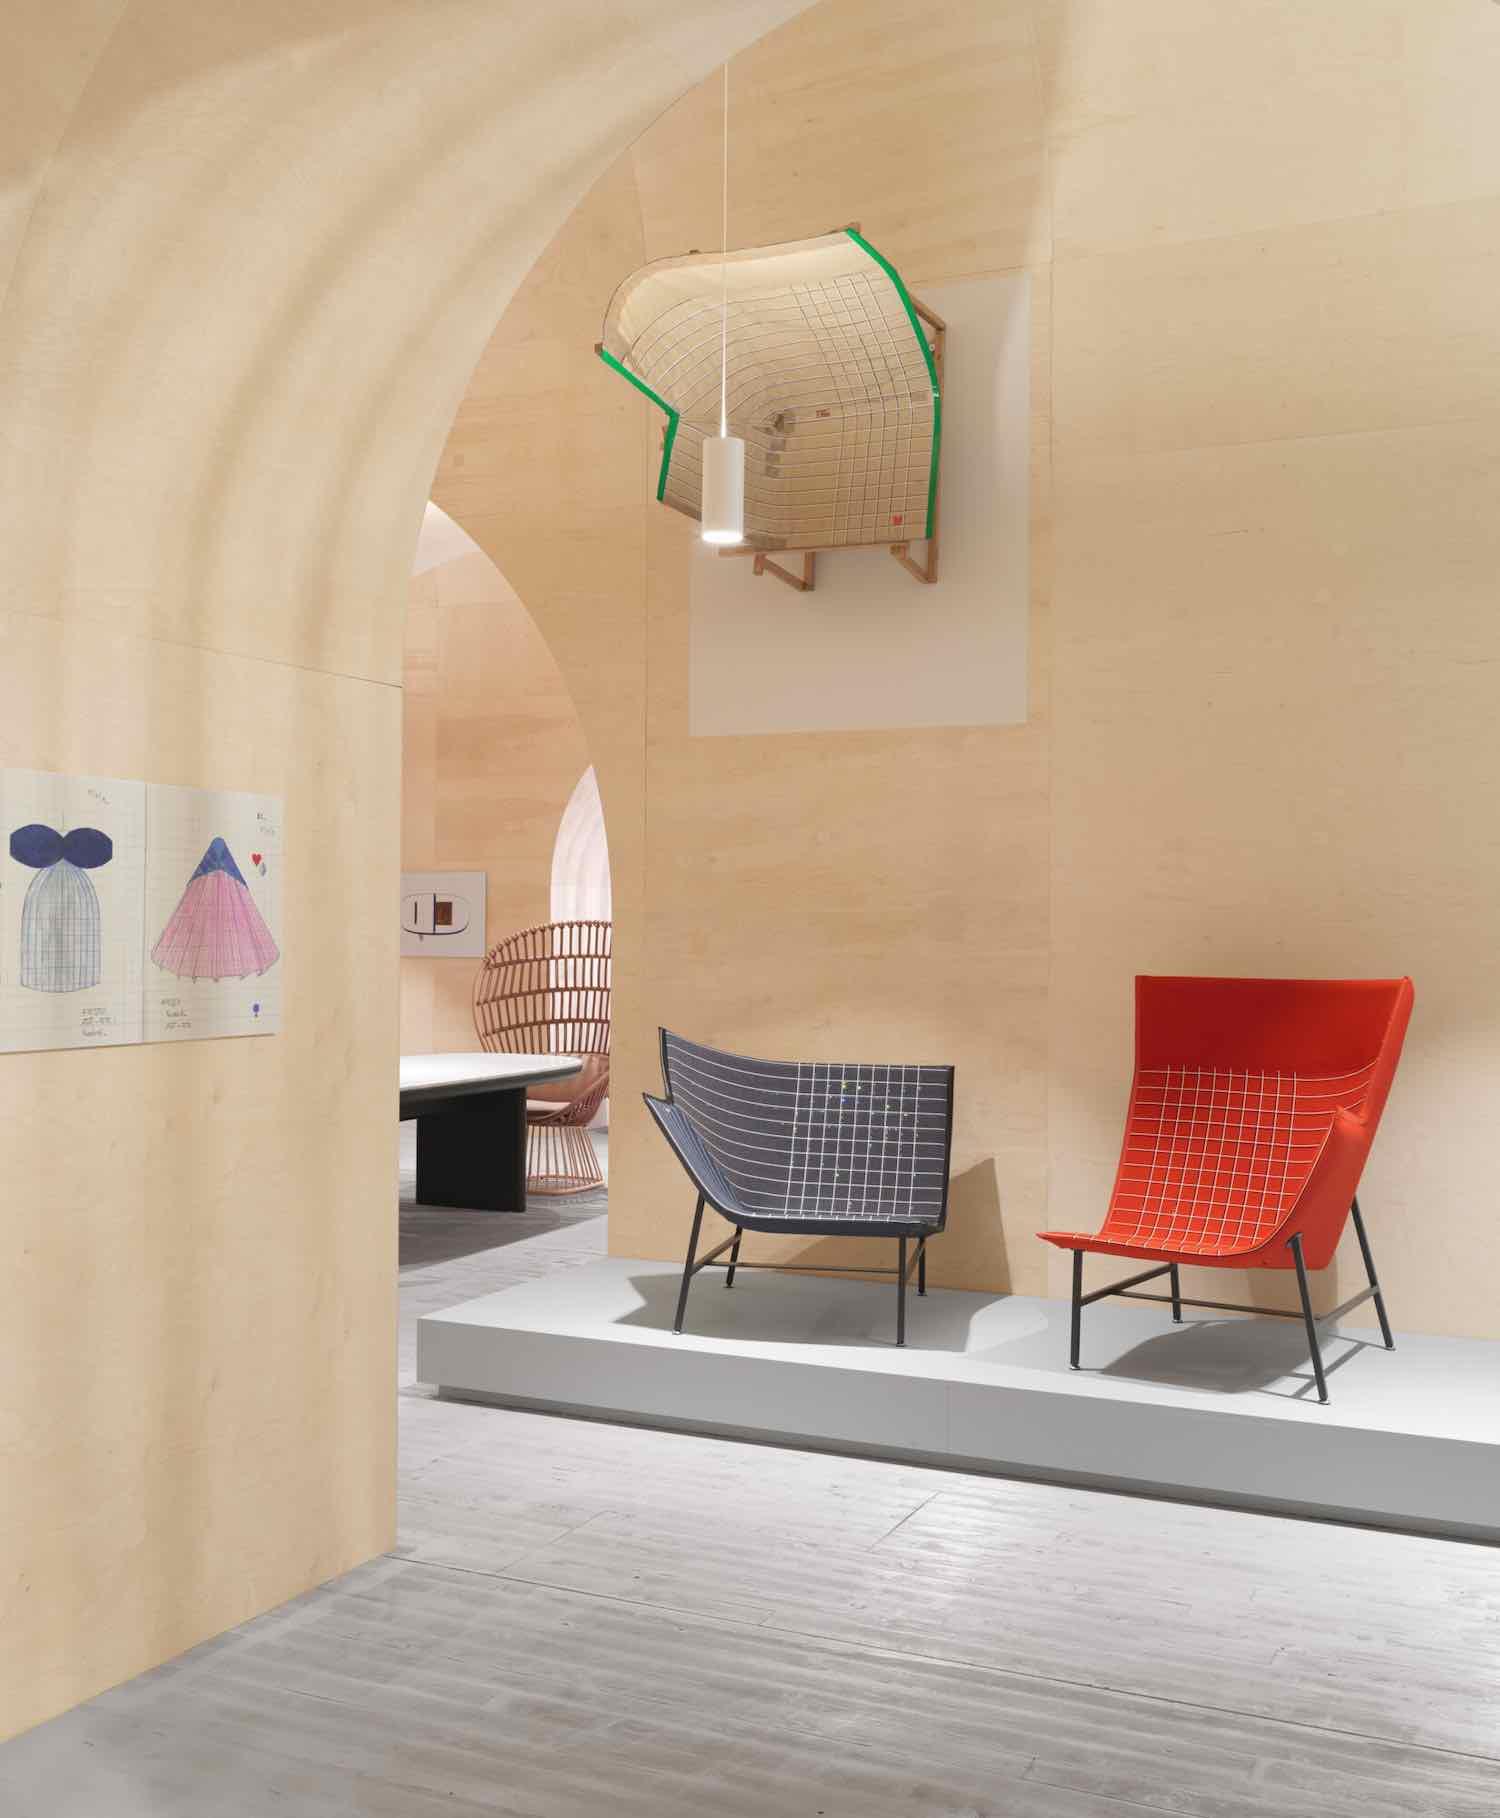 Labyrinthine pavilion by Doshi Levien @ Stockholm Furniture & Light Fair - Photo by Jonas Lindström.